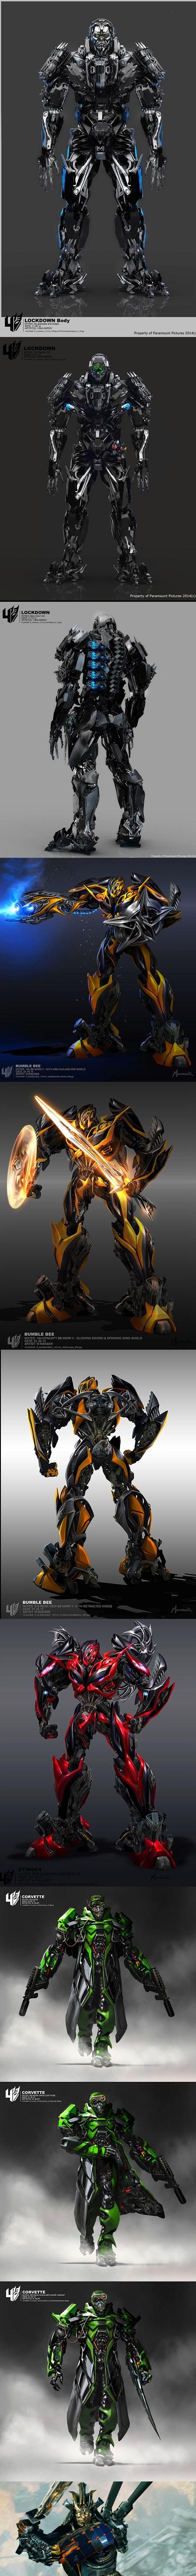 Concept Art des Transformers dans les Films Transformers - Page 5 3973687lockdownfullskullface1